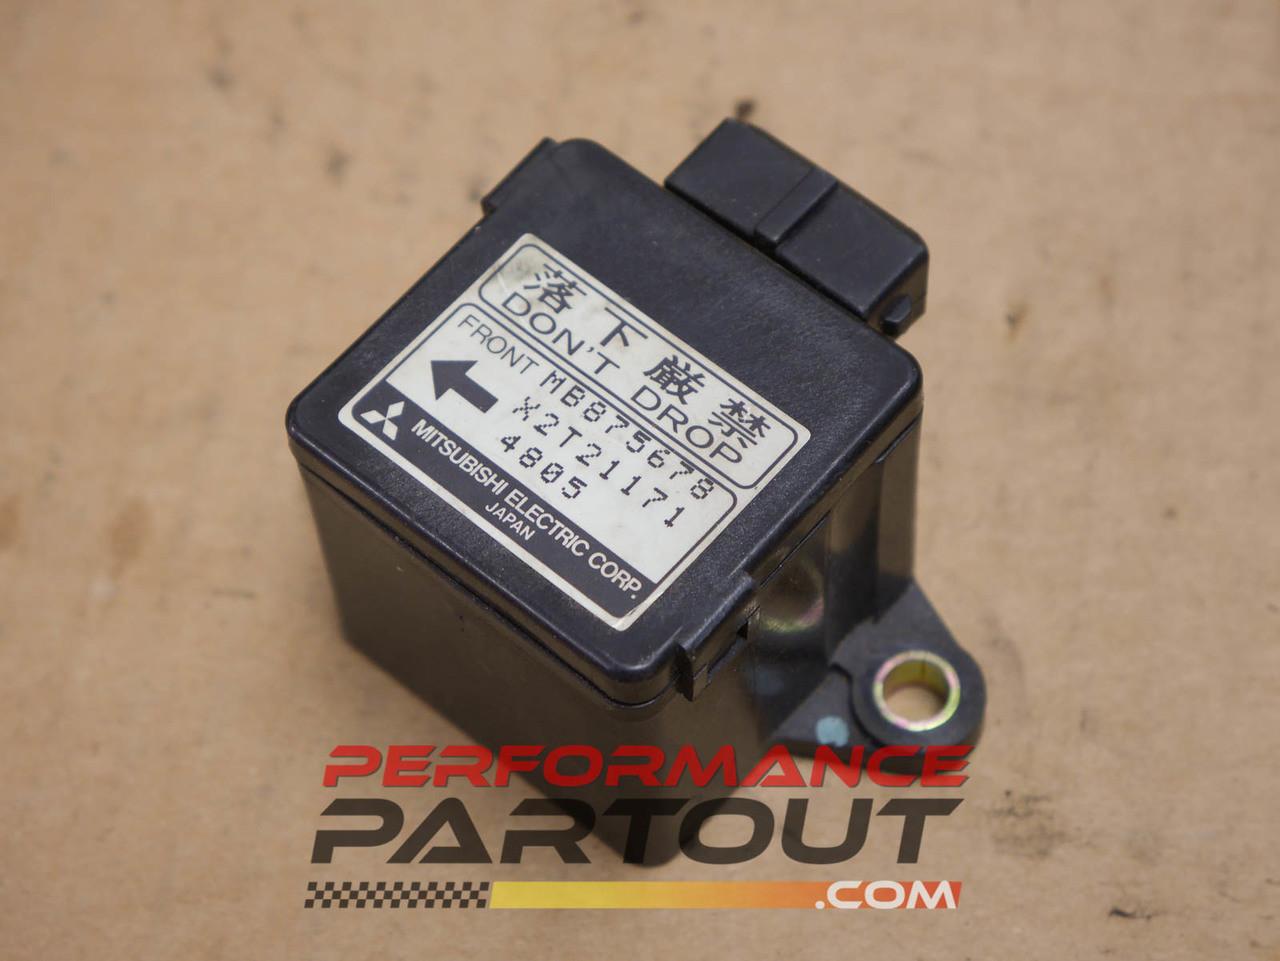 G Sensor For 2g Dsm Mb875678 Performance Partout Fuse Box Image 1